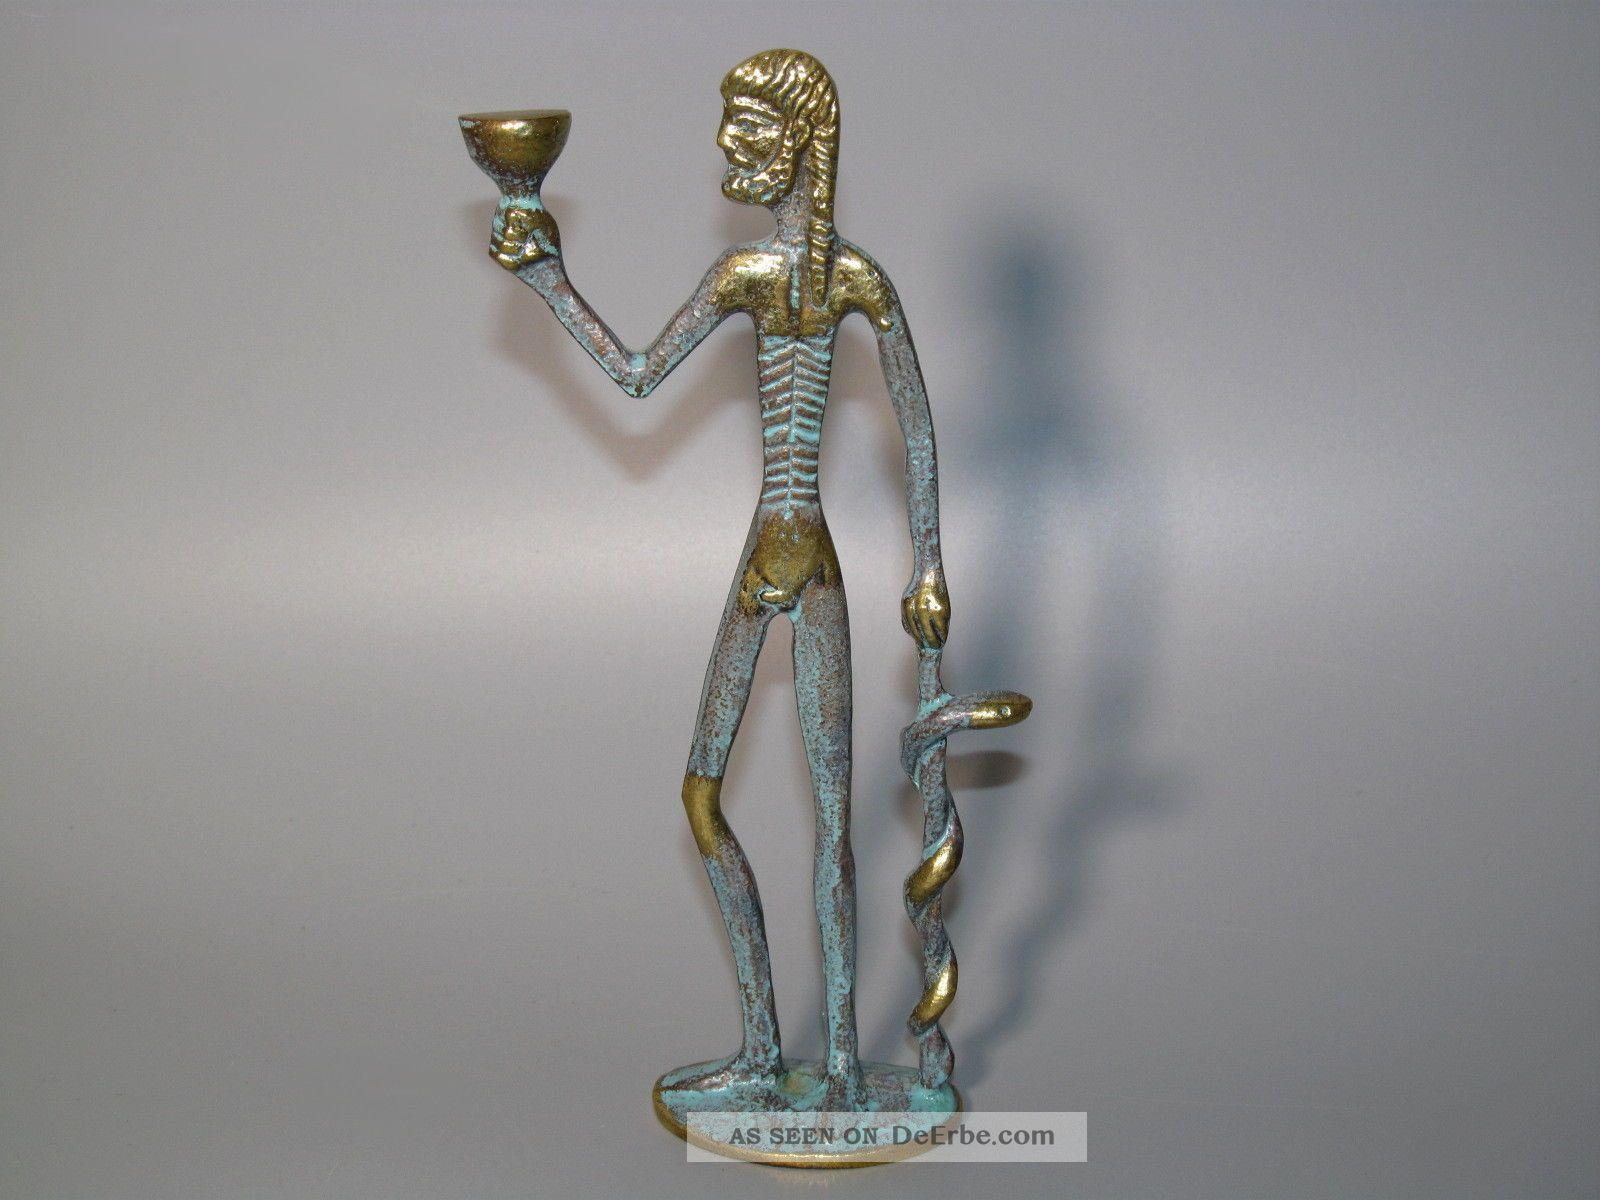 Hippokrates Von Kos Mit Äskulapstab Messing - Figur Skulptur Aeskulap - Stab Arzt 1950-1999 Bild